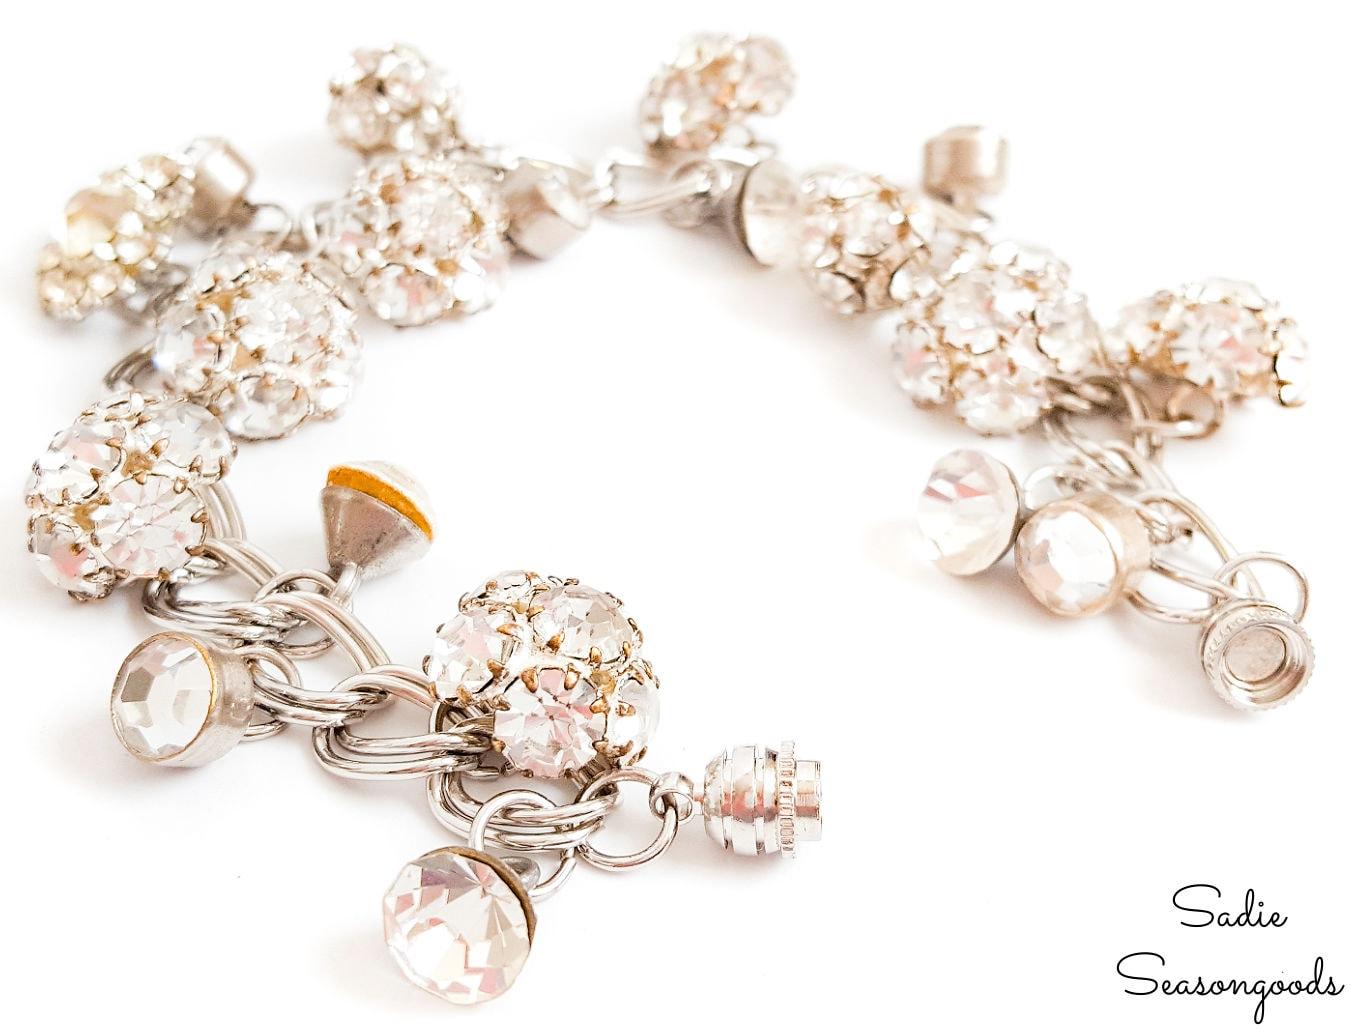 diy charm bracelet